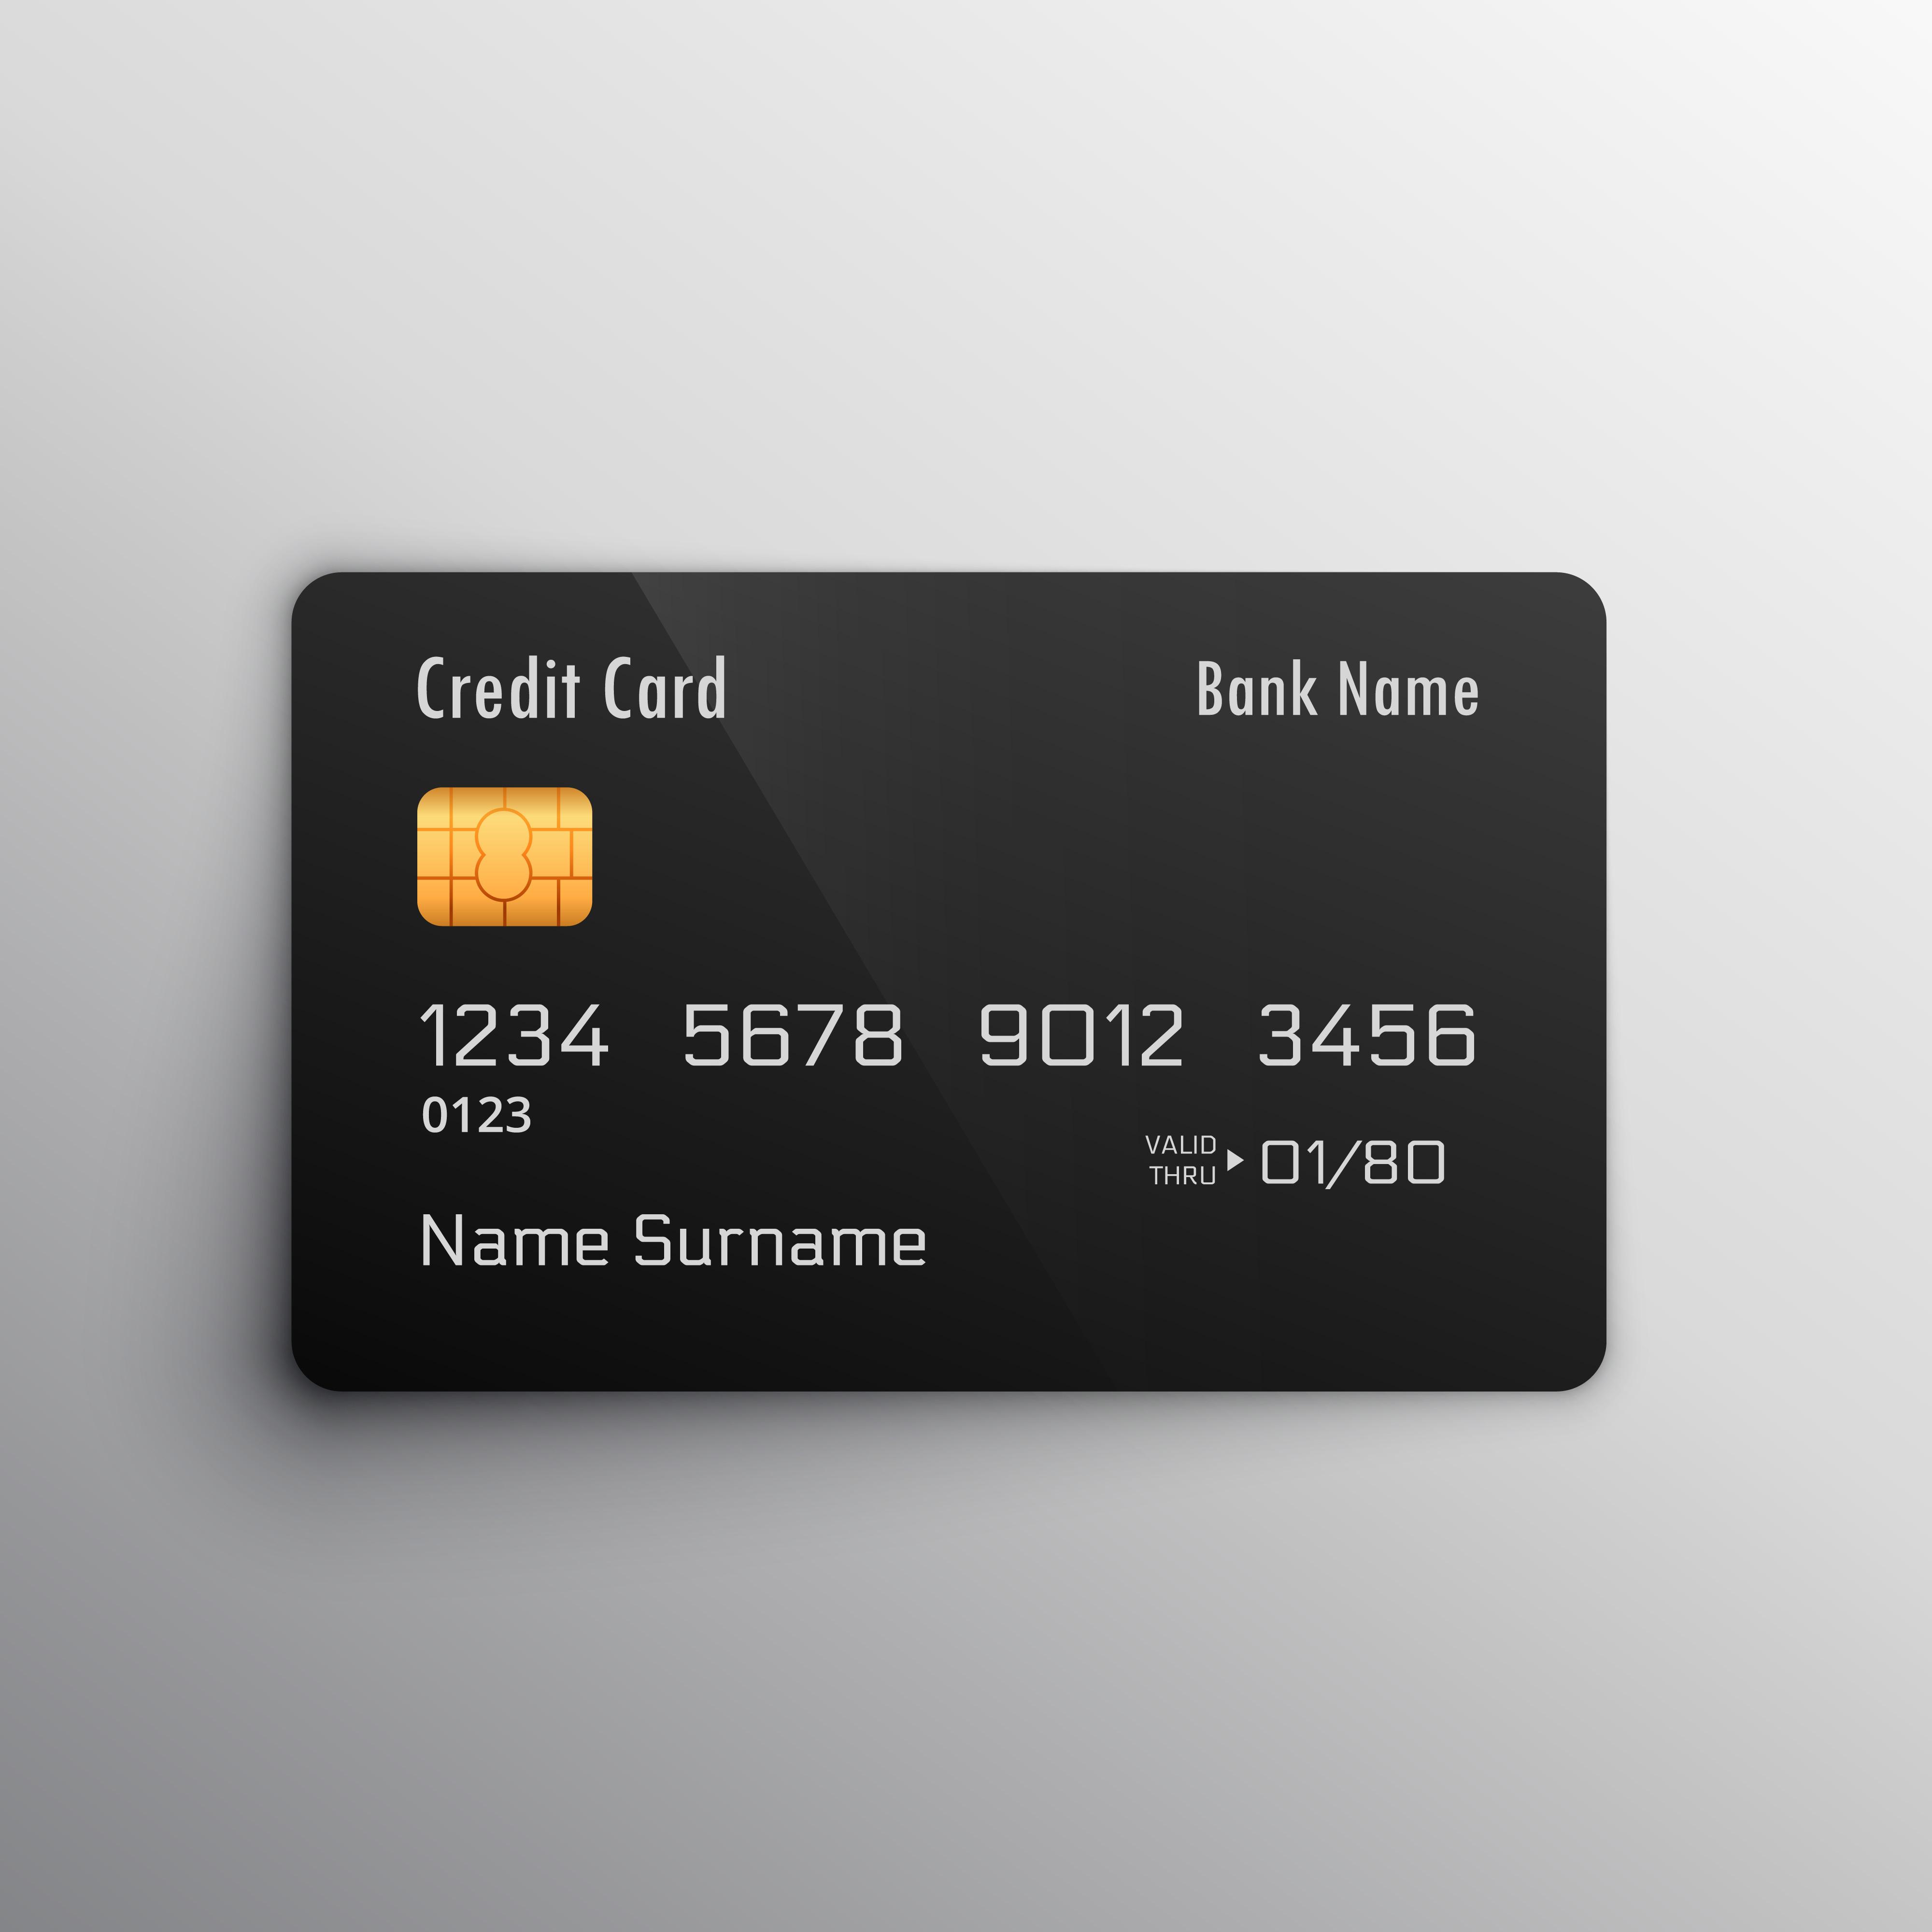 credit debit card mockup download free vector art stock graphics images. Black Bedroom Furniture Sets. Home Design Ideas